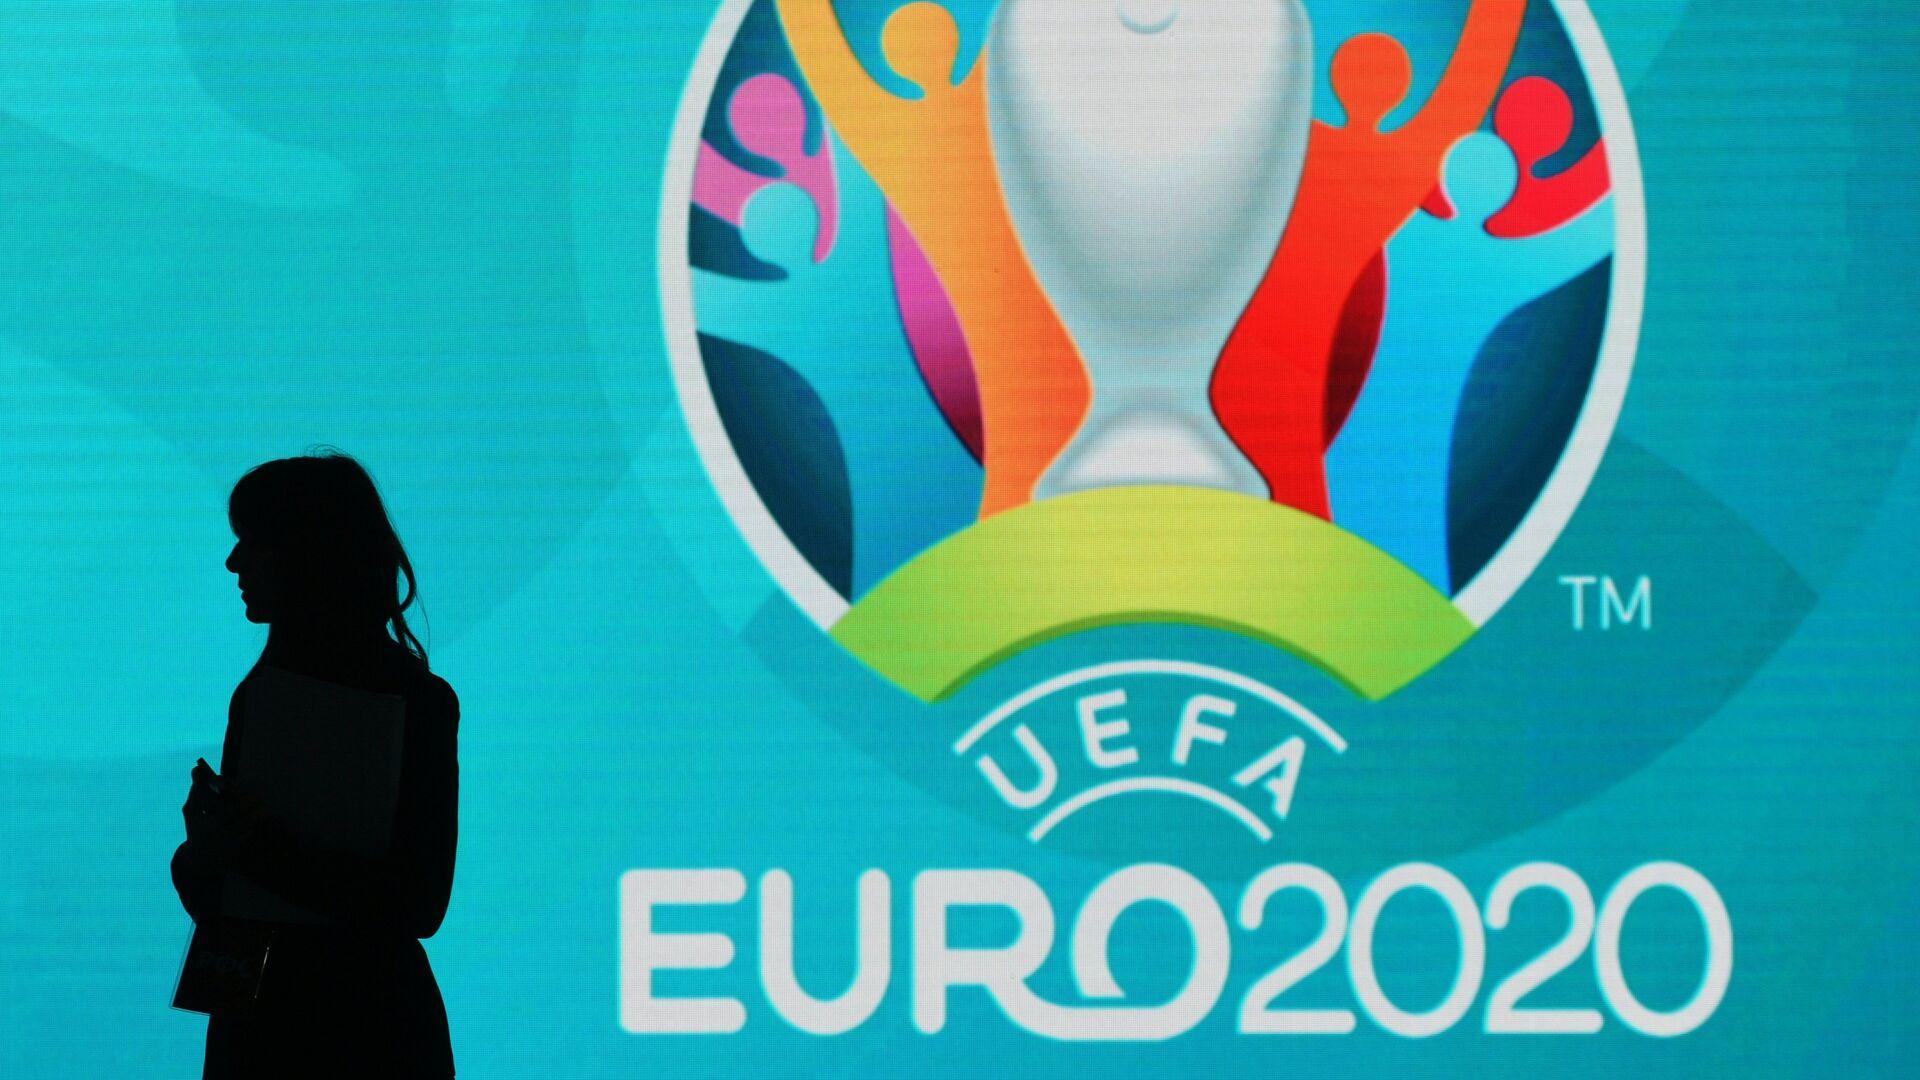 Логотип Евро-2020 по футболу - РИА Новости, 1920, 26.01.2021